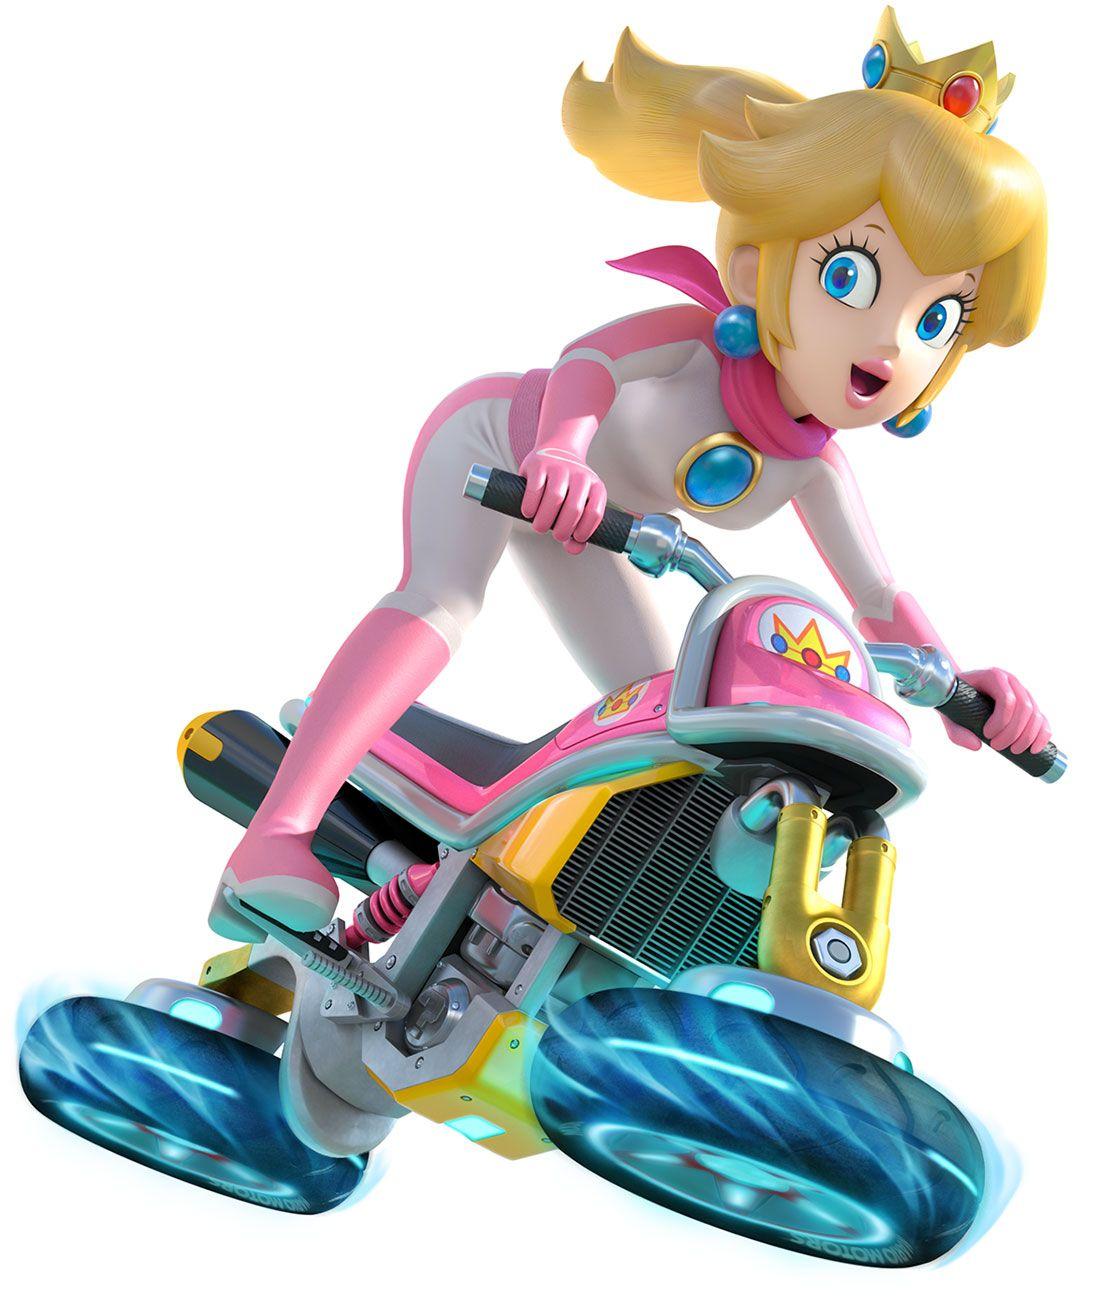 Peach Mario Kart 8 Art References & Inspirations